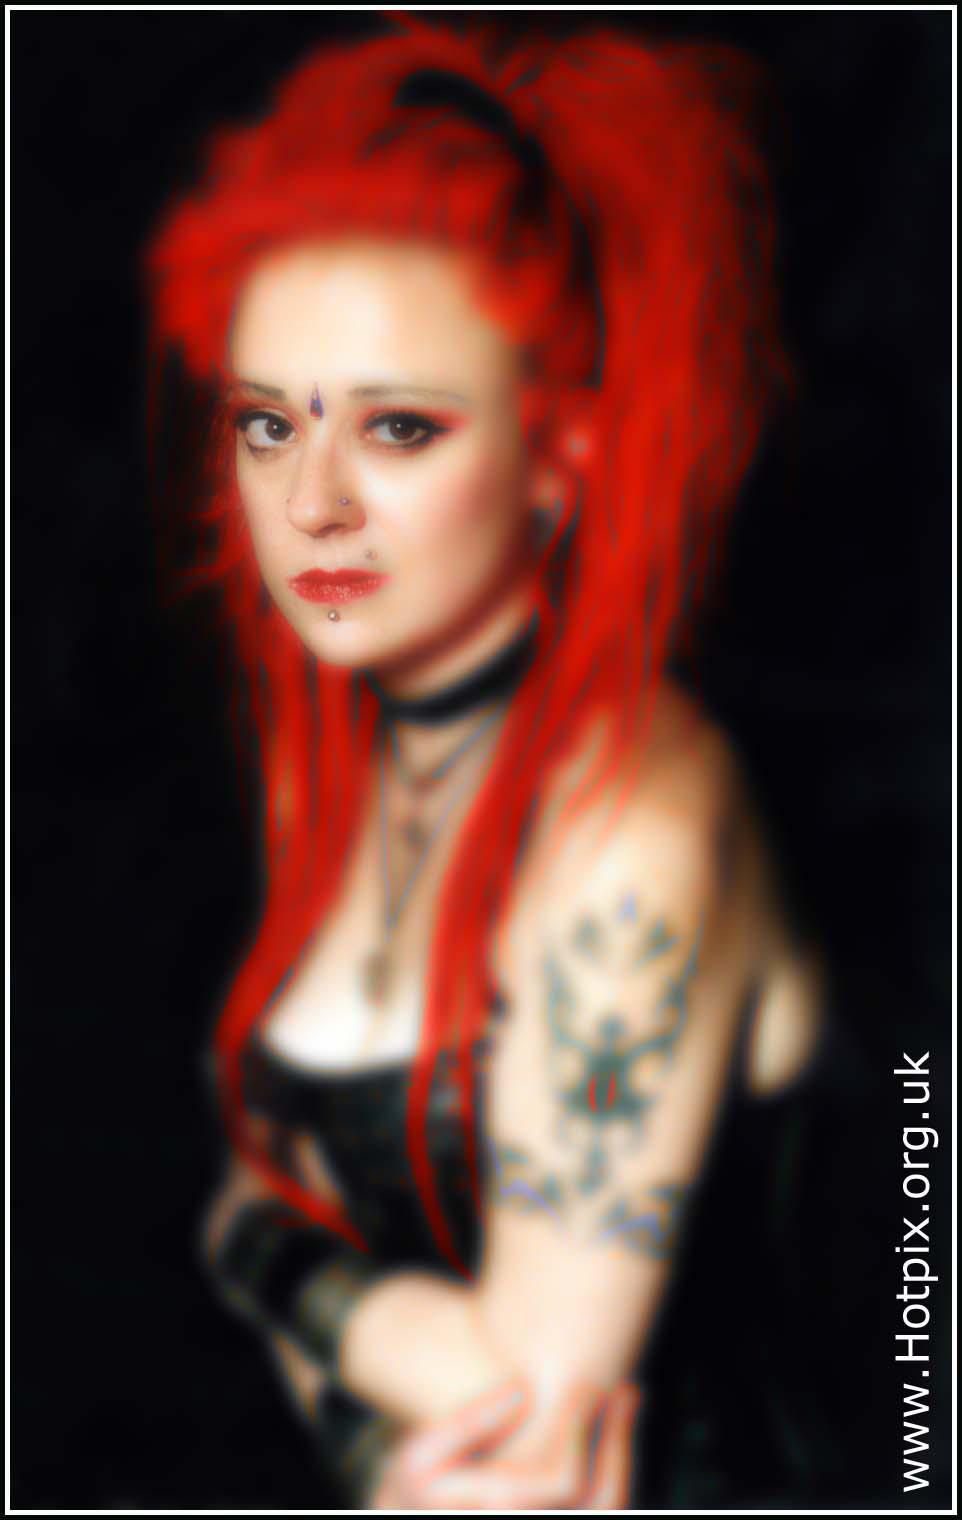 red,hair,black,portrait,girl,woman,sex,lady,sexy,tat2,tattoo,tattoos,leather,lace,female,tonysmith,hotpix,tony,smith,light,stream,lightstream,Freedance Photographers,sensual,hotpicks,Memory Corner - Portraits,muchacha,femenina,de,la,mujer,se\u00f1ora,\u5973\u6027\u30e1\u30b9\u306e\u5973\u6027\u306e\u5973\u306e\u5b50,\u592b\u4eba\u5973\u6027\u5987\u5973\u5973\u5b69,fille,f\u00e9minine,femme,dame,racy